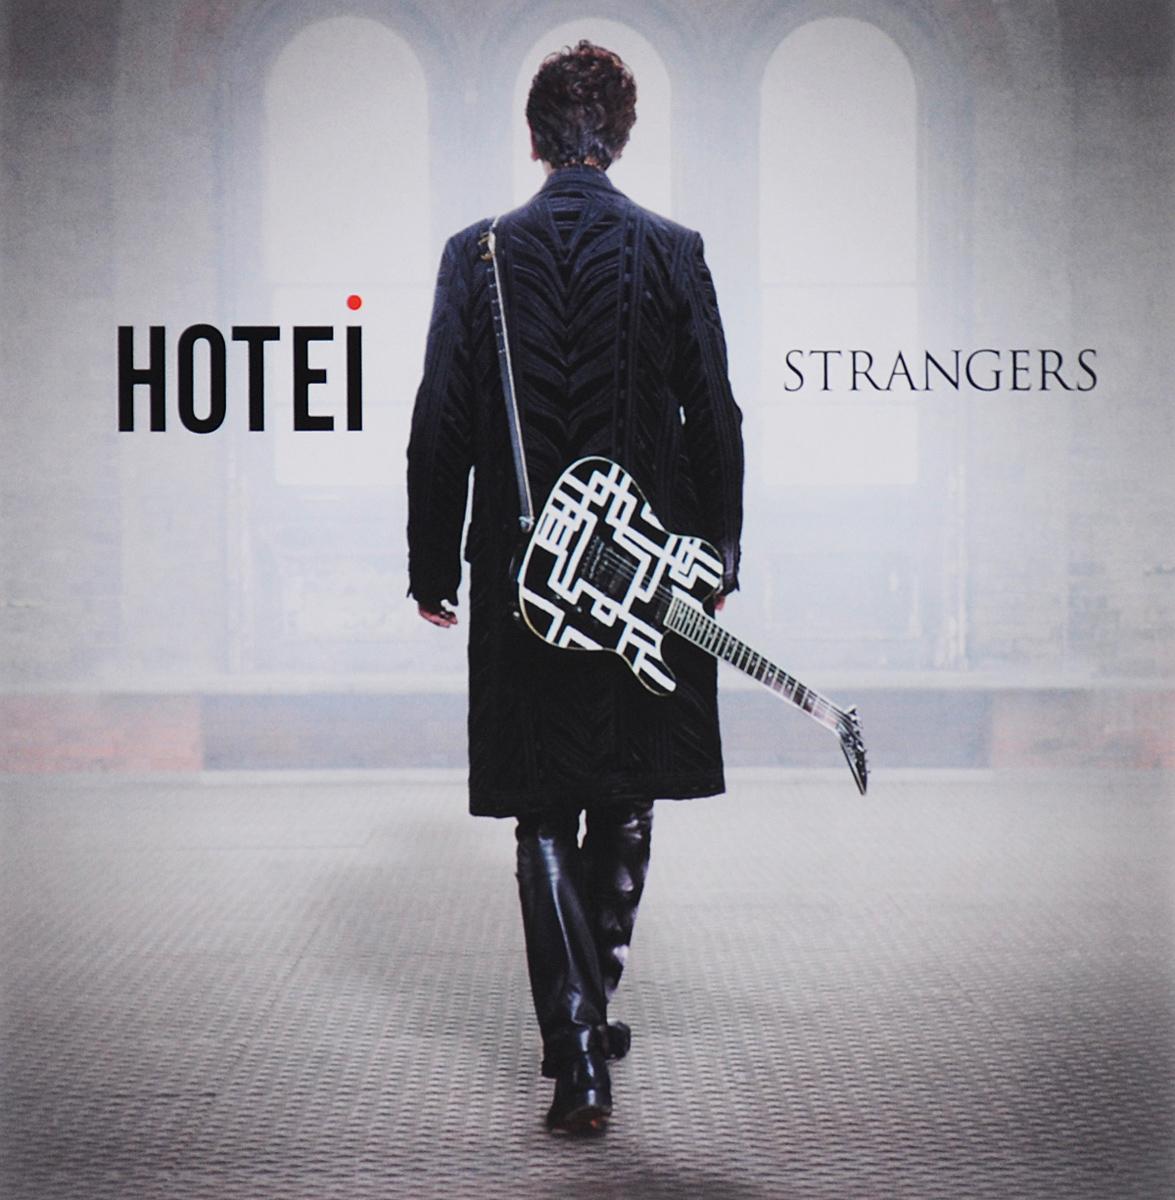 Томоясу Хотеи Hotei. Strangers touching strangers